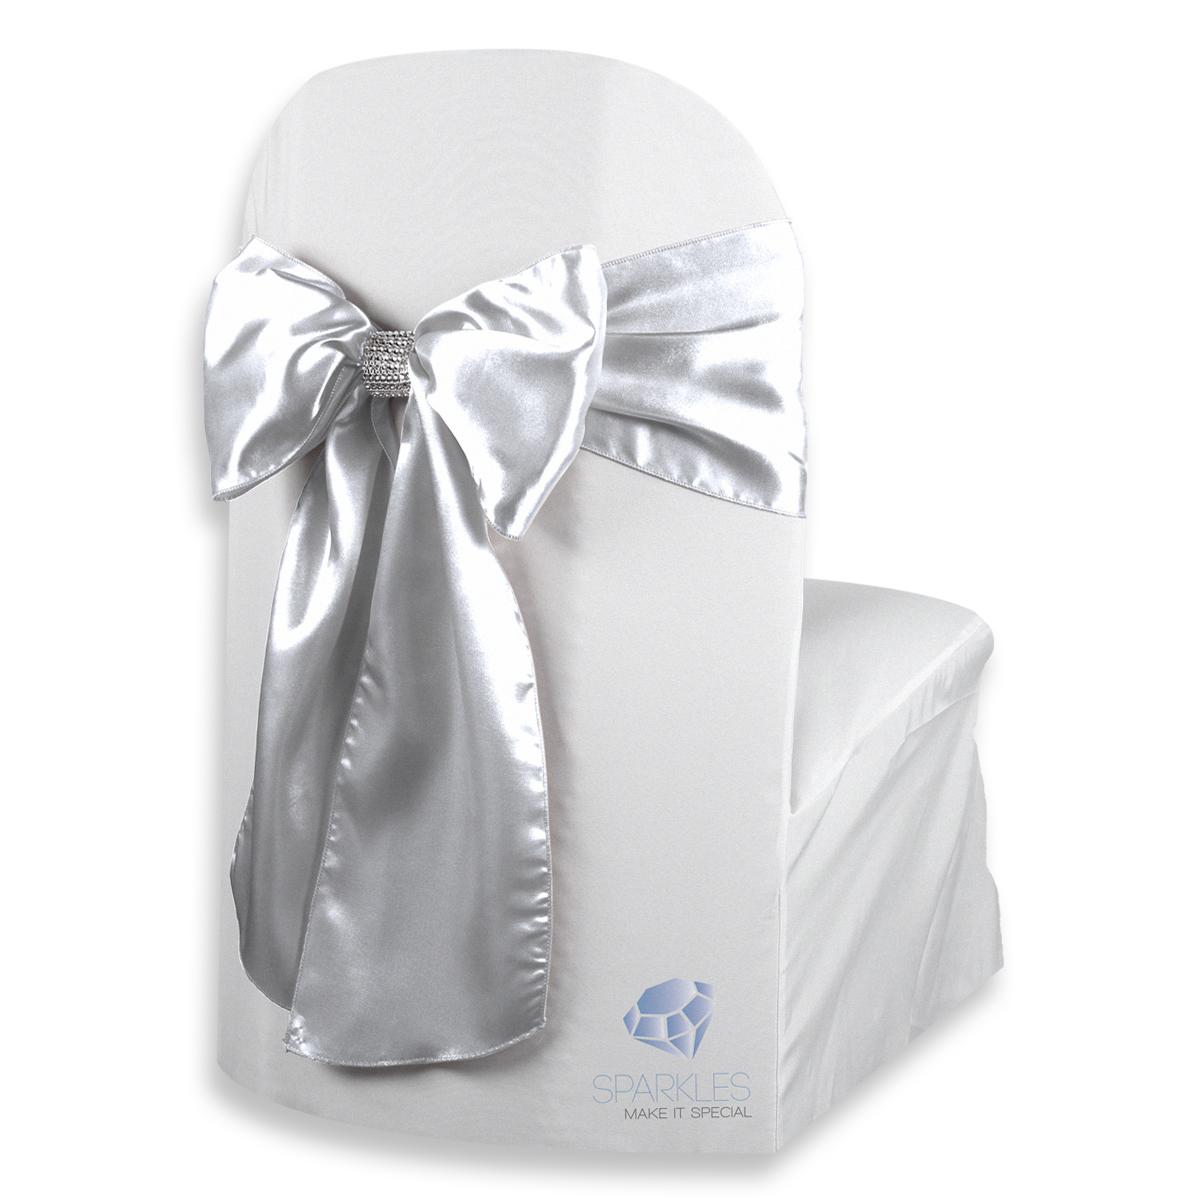 50-pcs-Satin-Chair-Cover-Bow-Sash-108-034-x8-034-Wedding-Party-Banquet-Reception